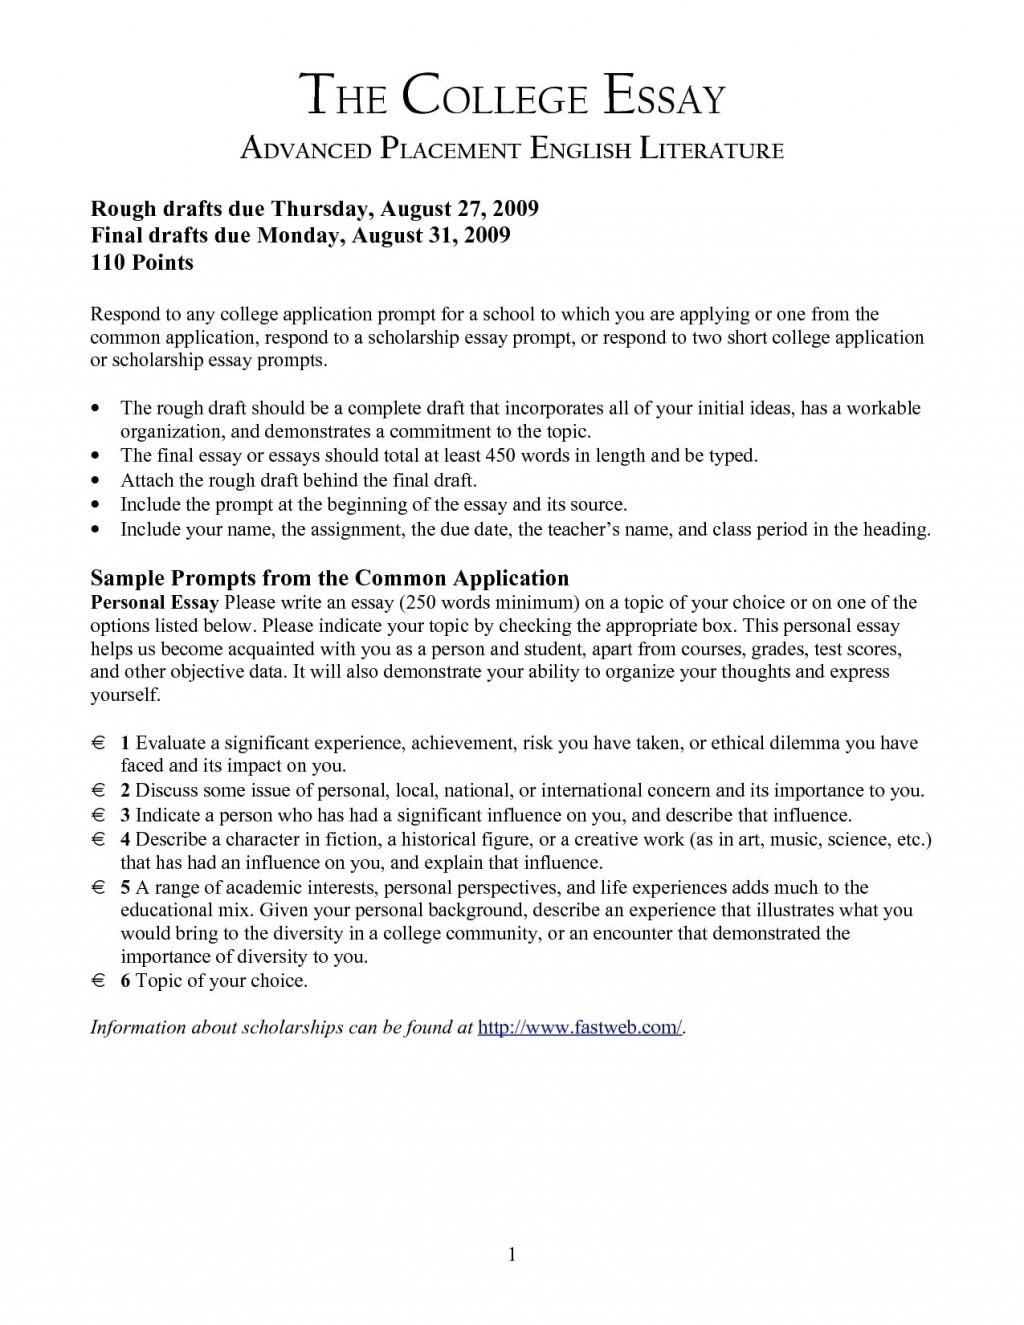 002 Scholarship Essay Prompts Example College Printables Corner Topics List Format Cover Letter And Bussin Magnificent Robertson 2018-19 Vanderbilt Washington Lee Johnson Large